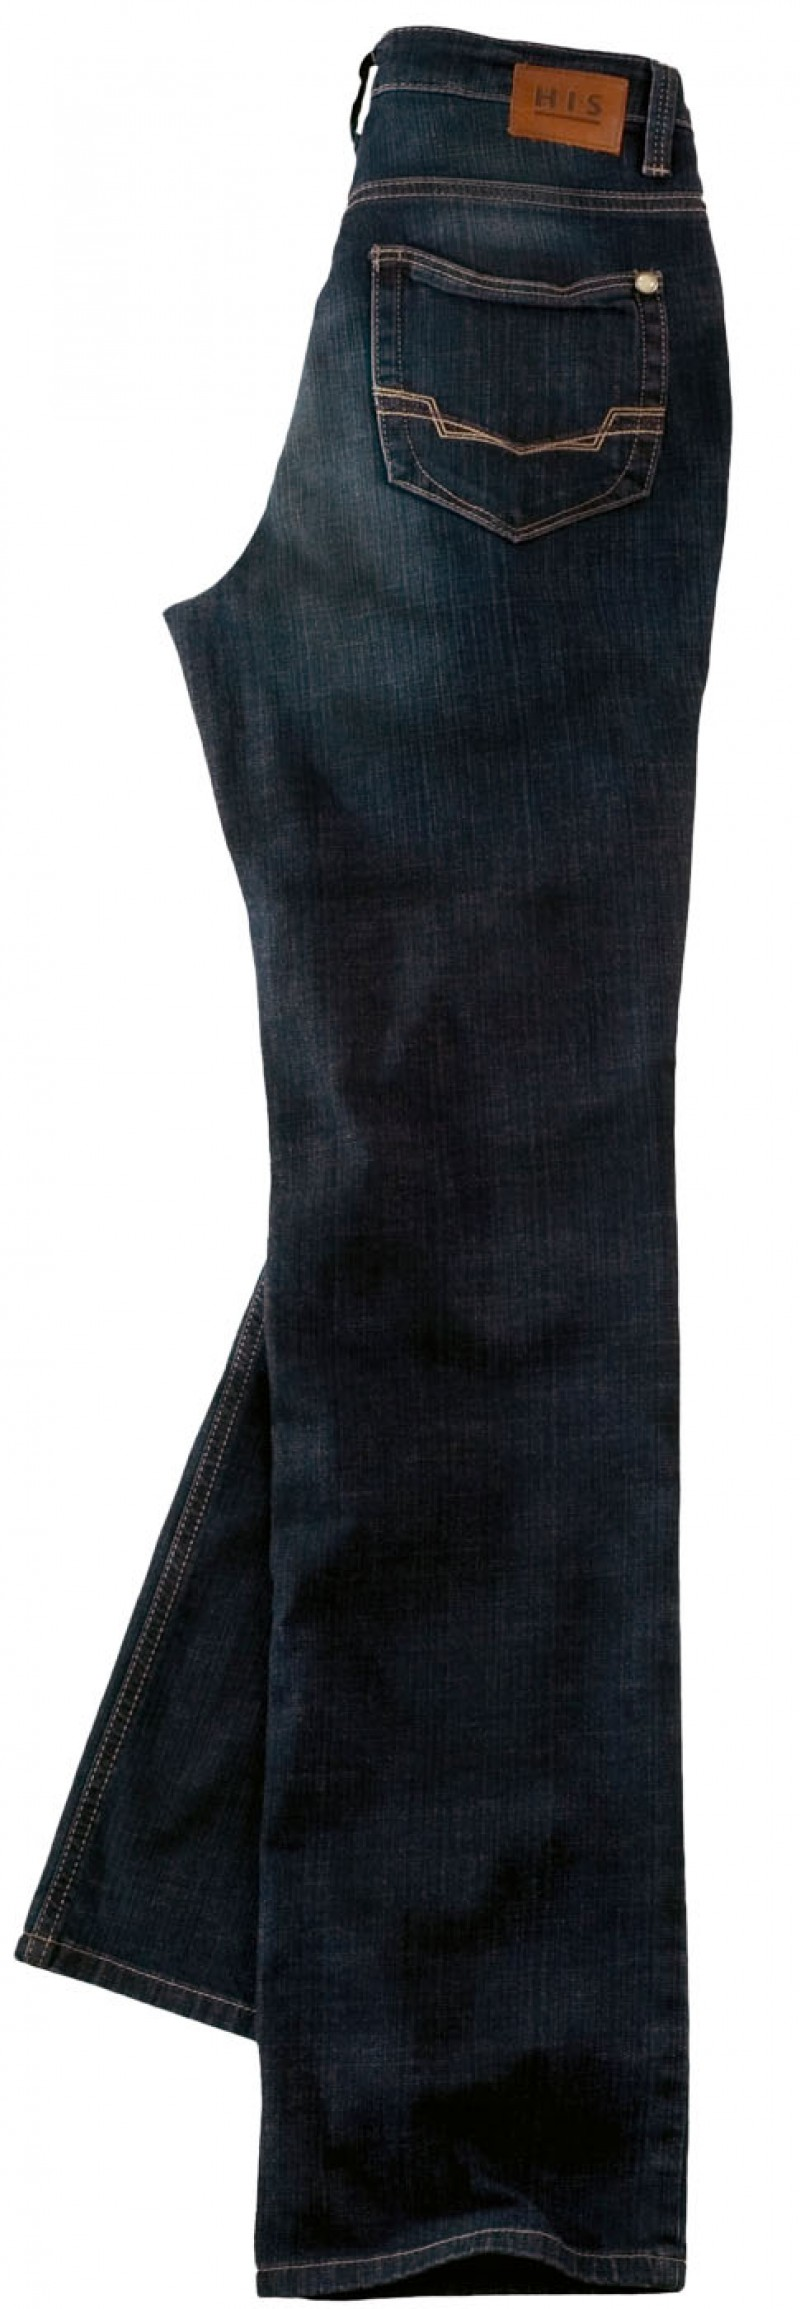 HIS Coletta Jeans - Straight Leg - Dark Tinted